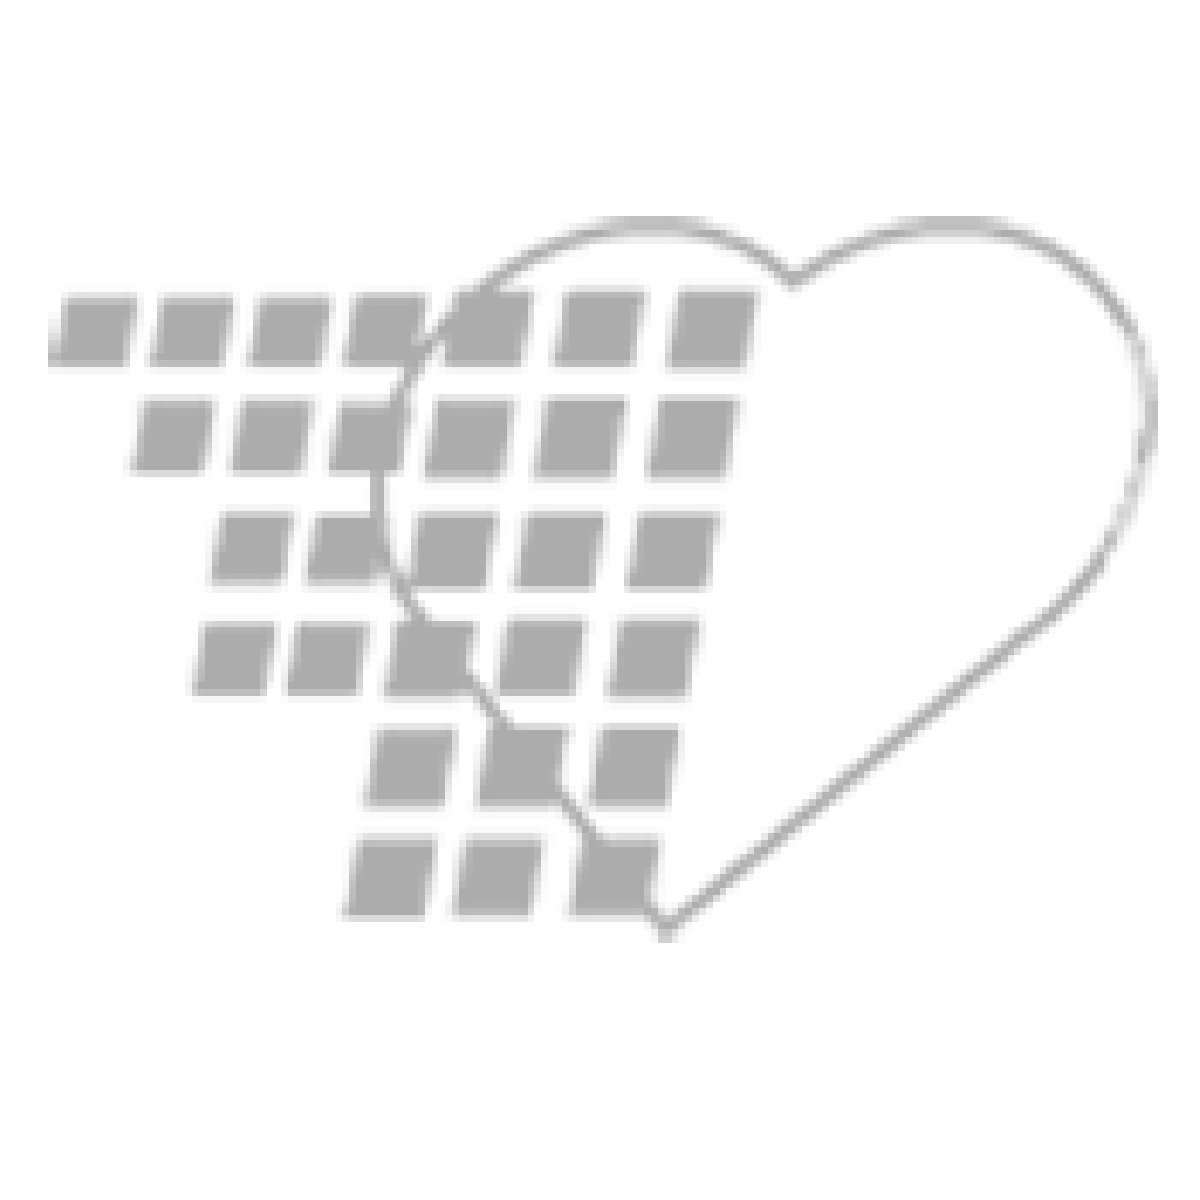 07-71-8199 Posey® Cufflator™ Endotracheal Tube Inflator and Manometer